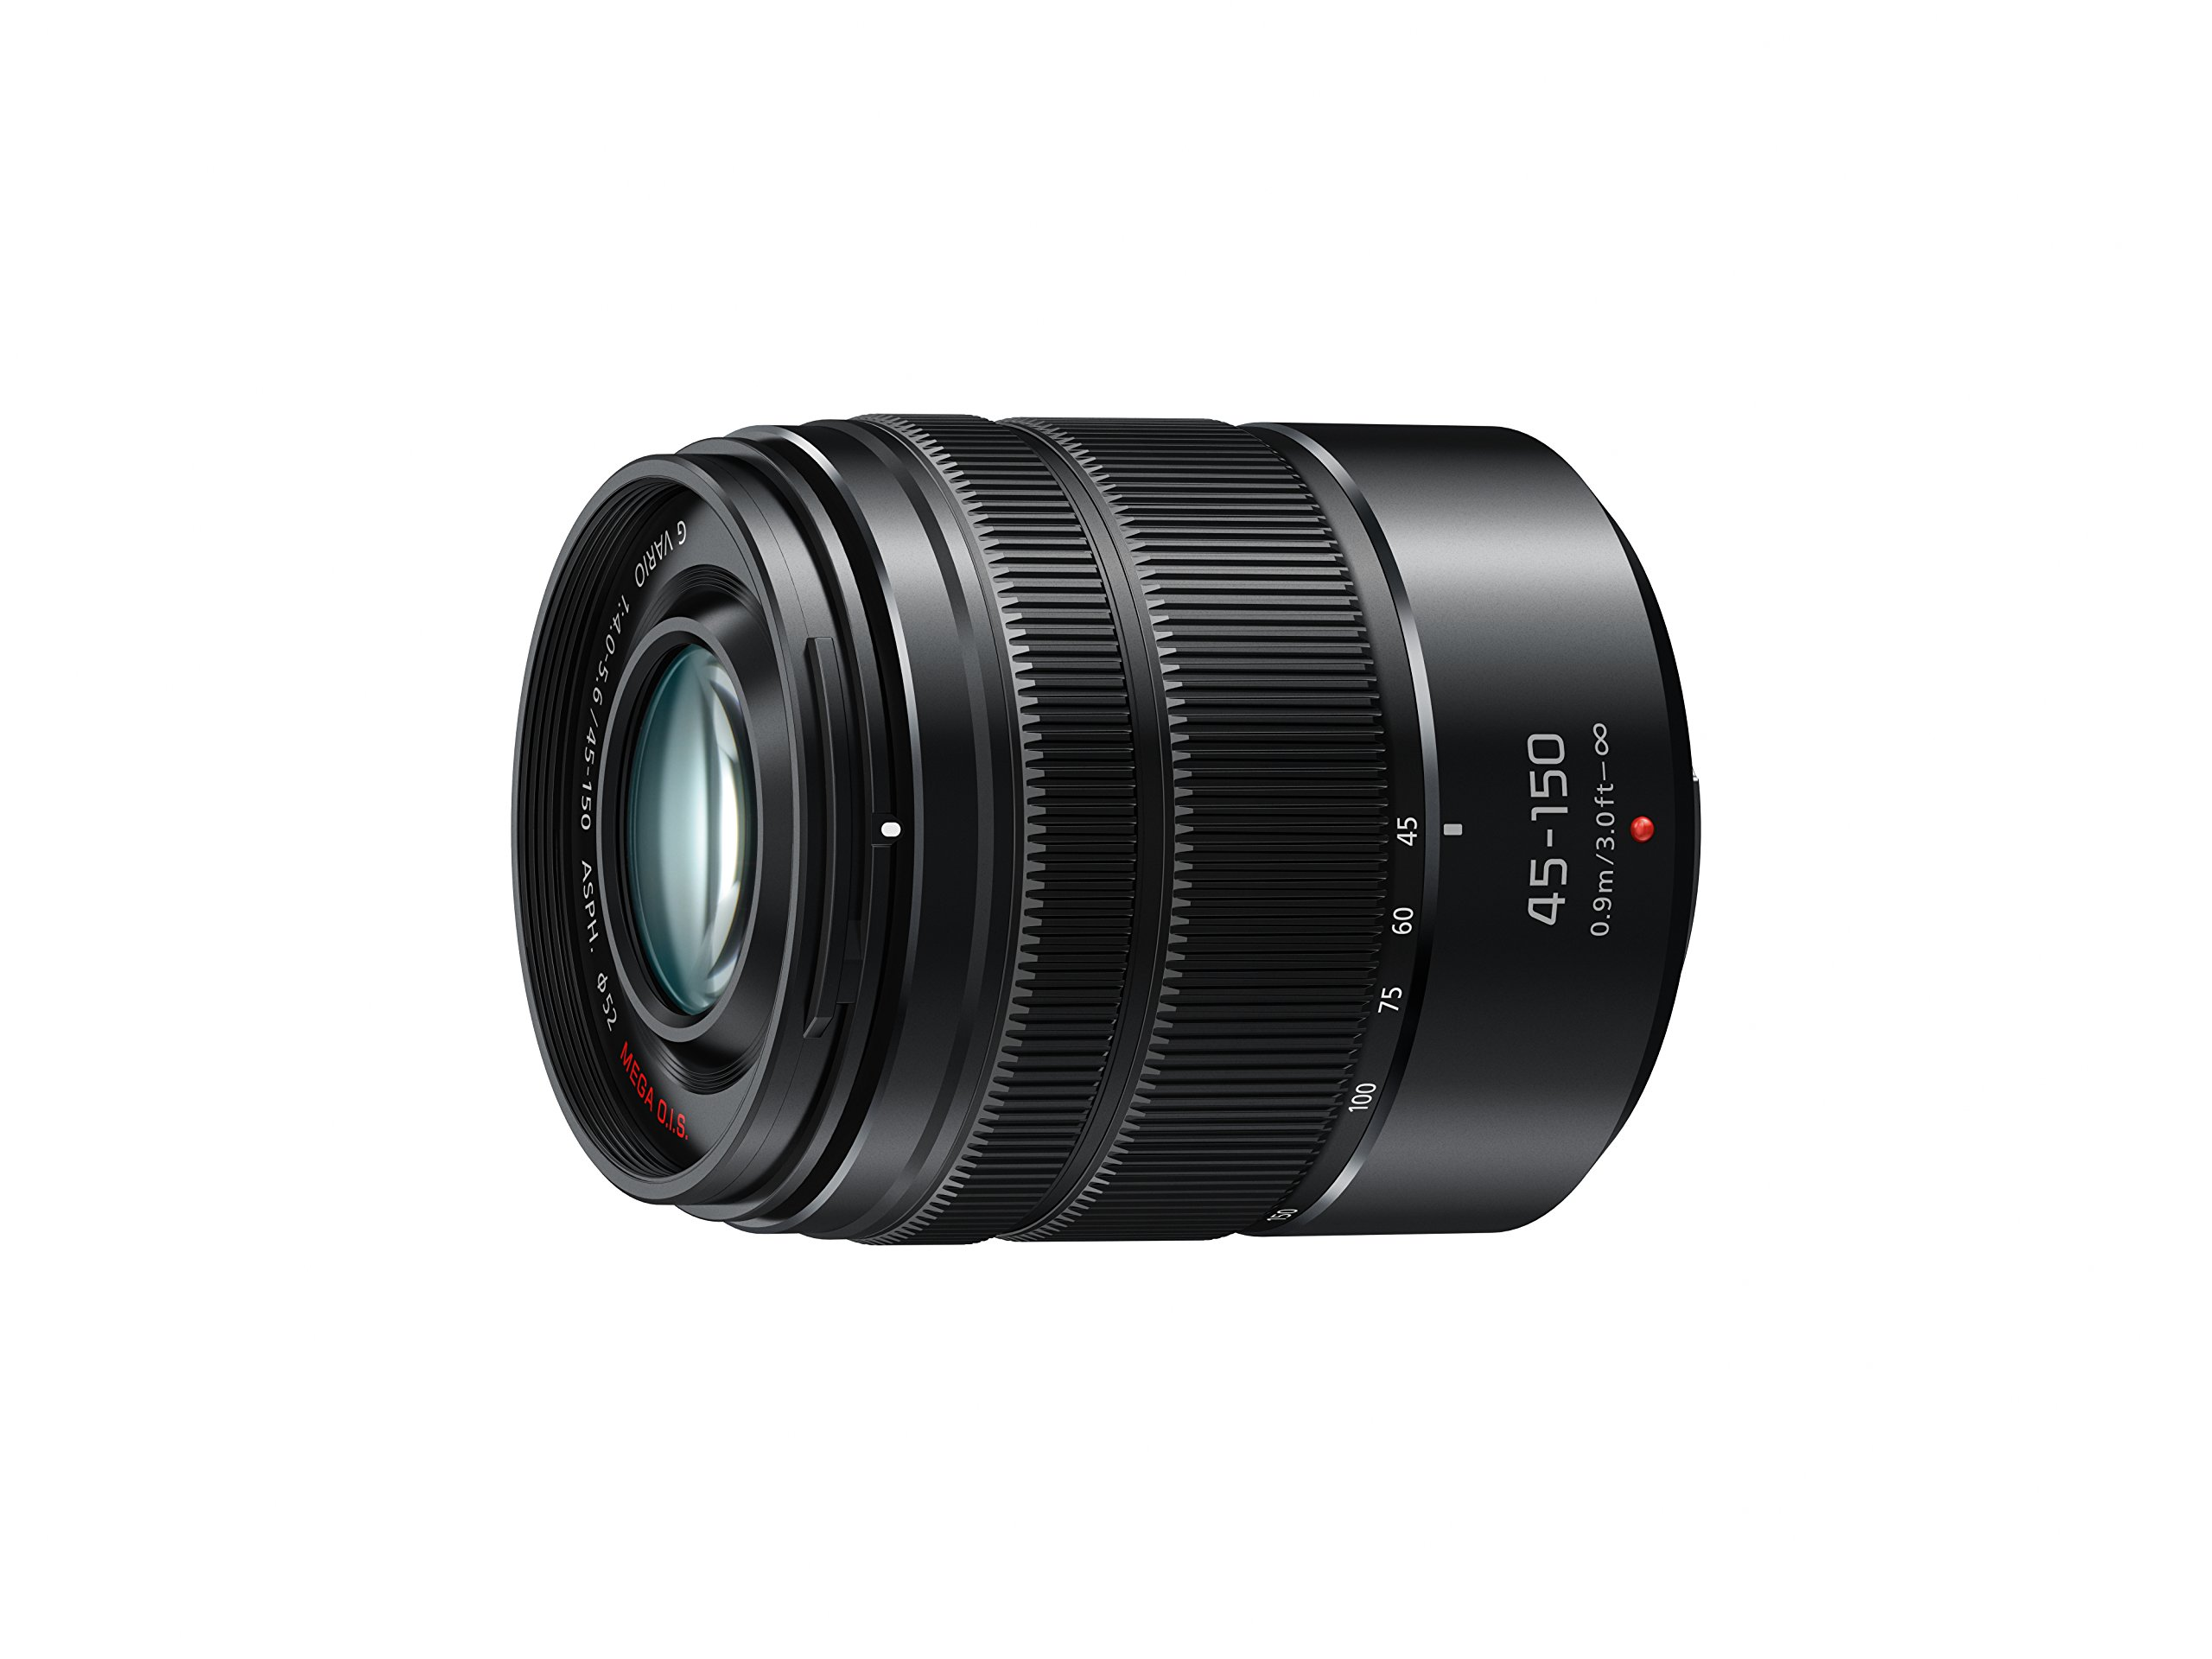 Lumix Gx800 Top Deals Lowest Price Panasonic Dc Gf10 Kit 12 32mm Kamera Mirrorless Black G Vario Lens 45 150mm F40 56 Asph